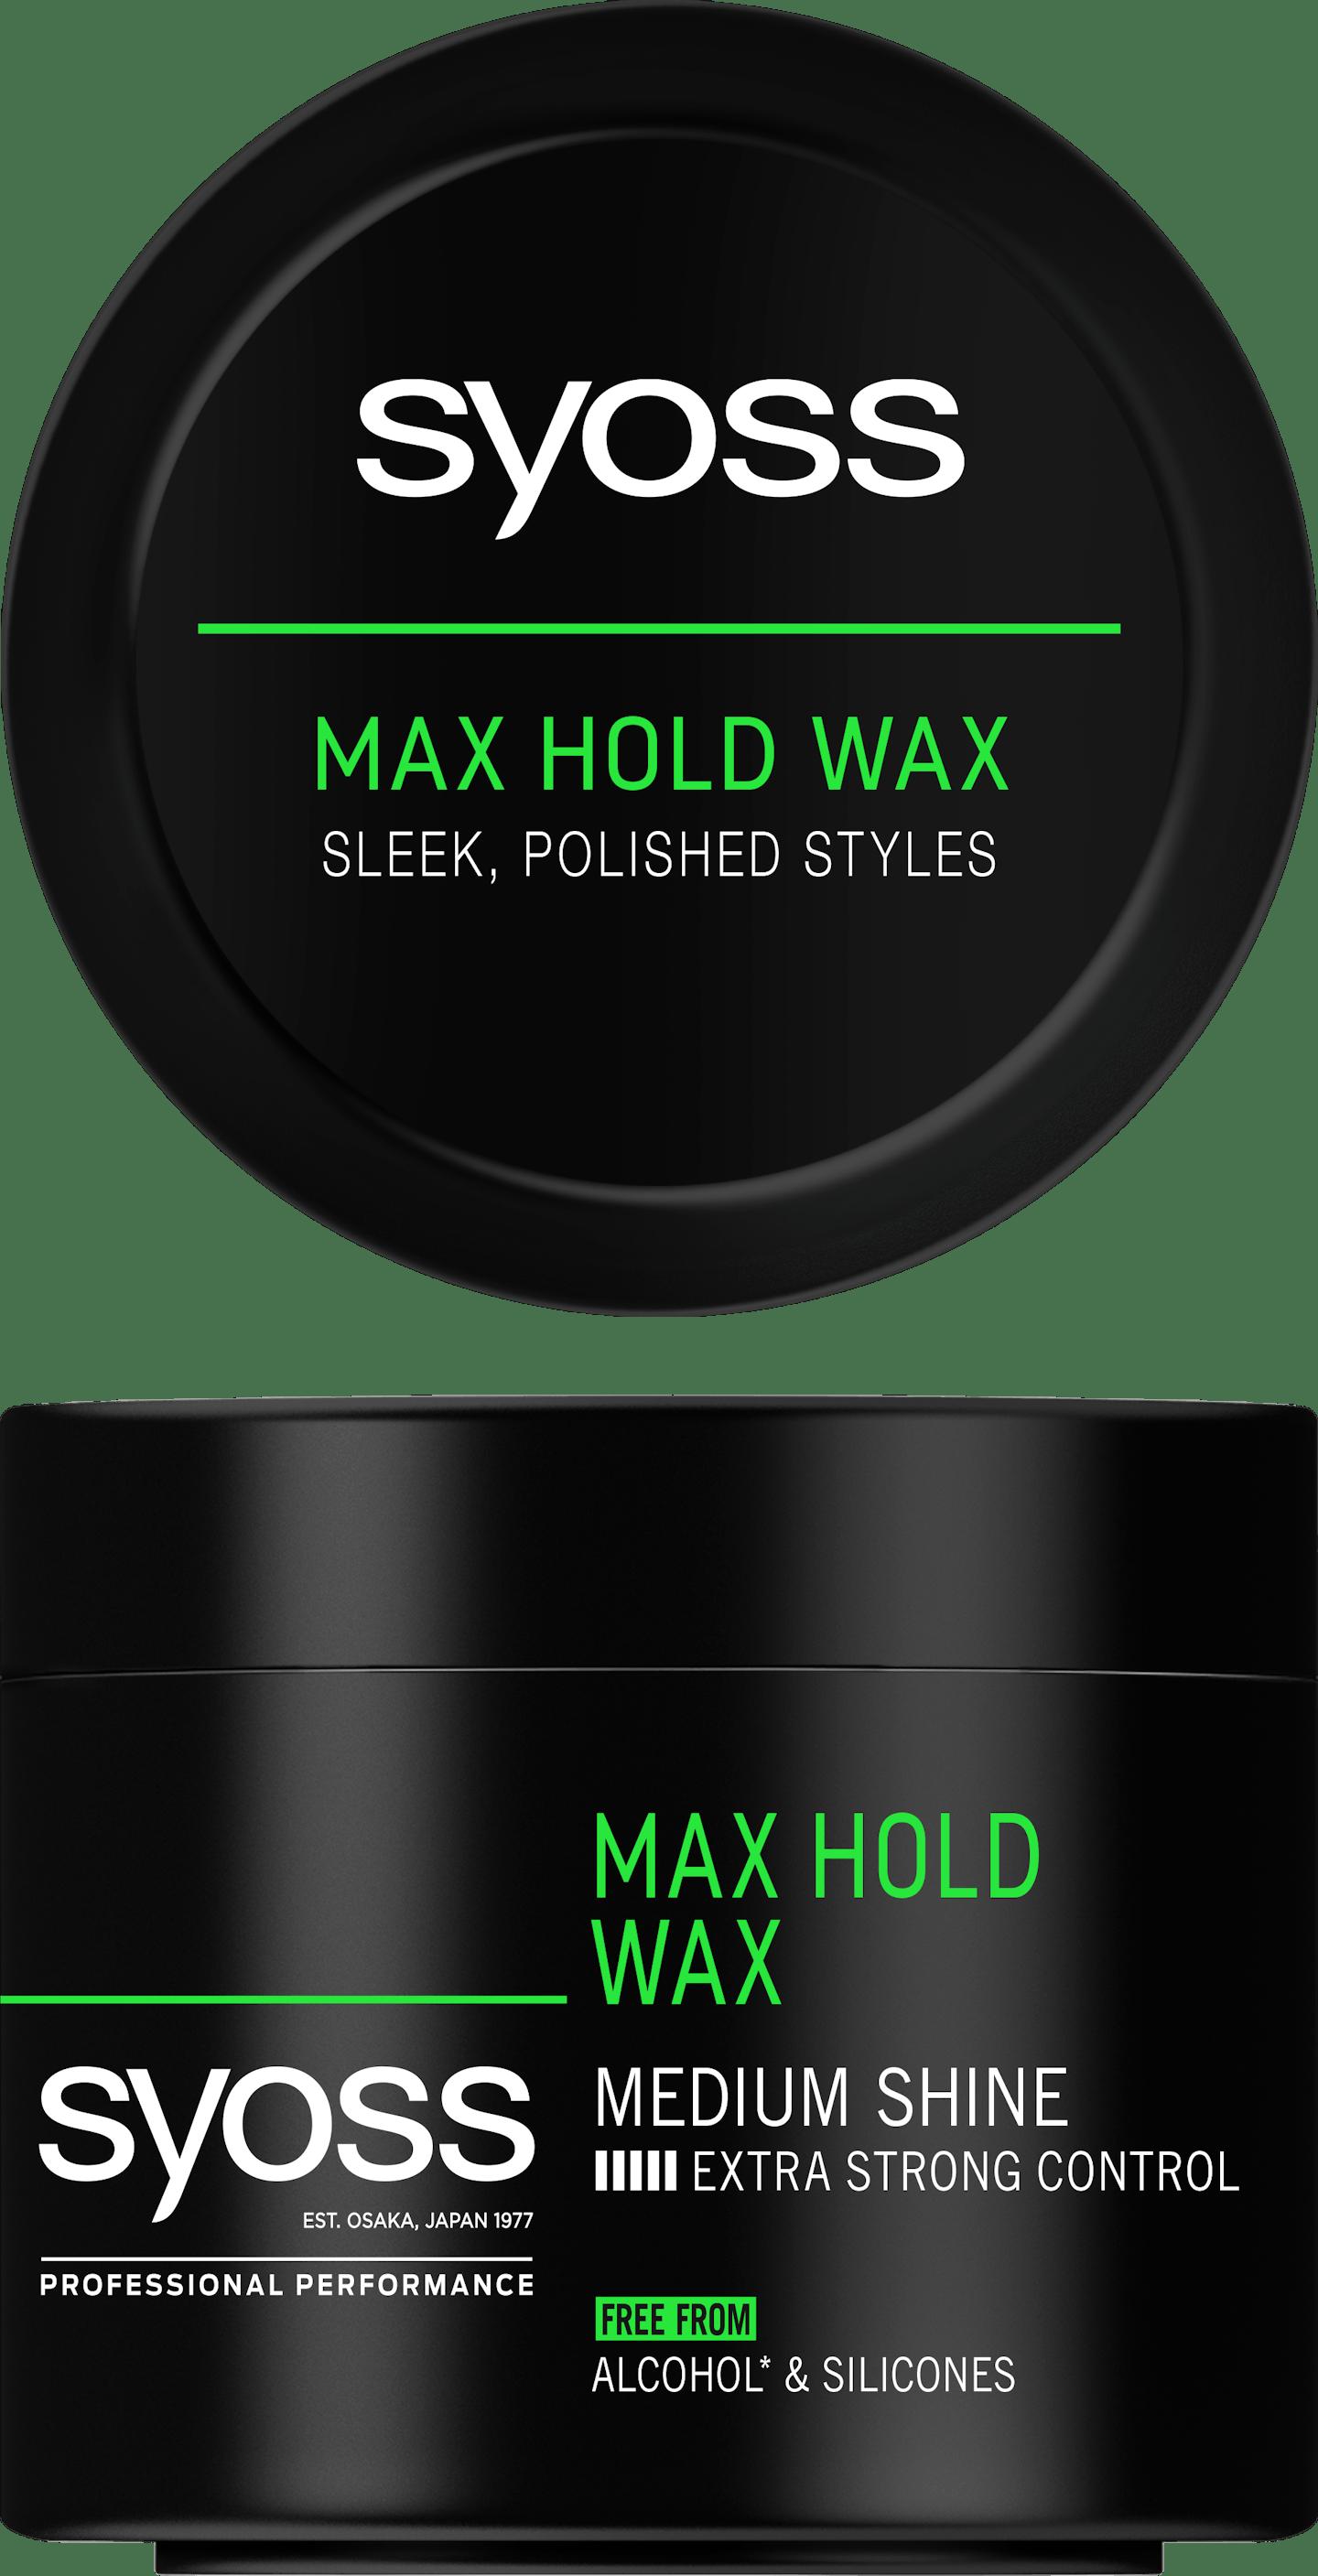 Syoss Max Hold Wax